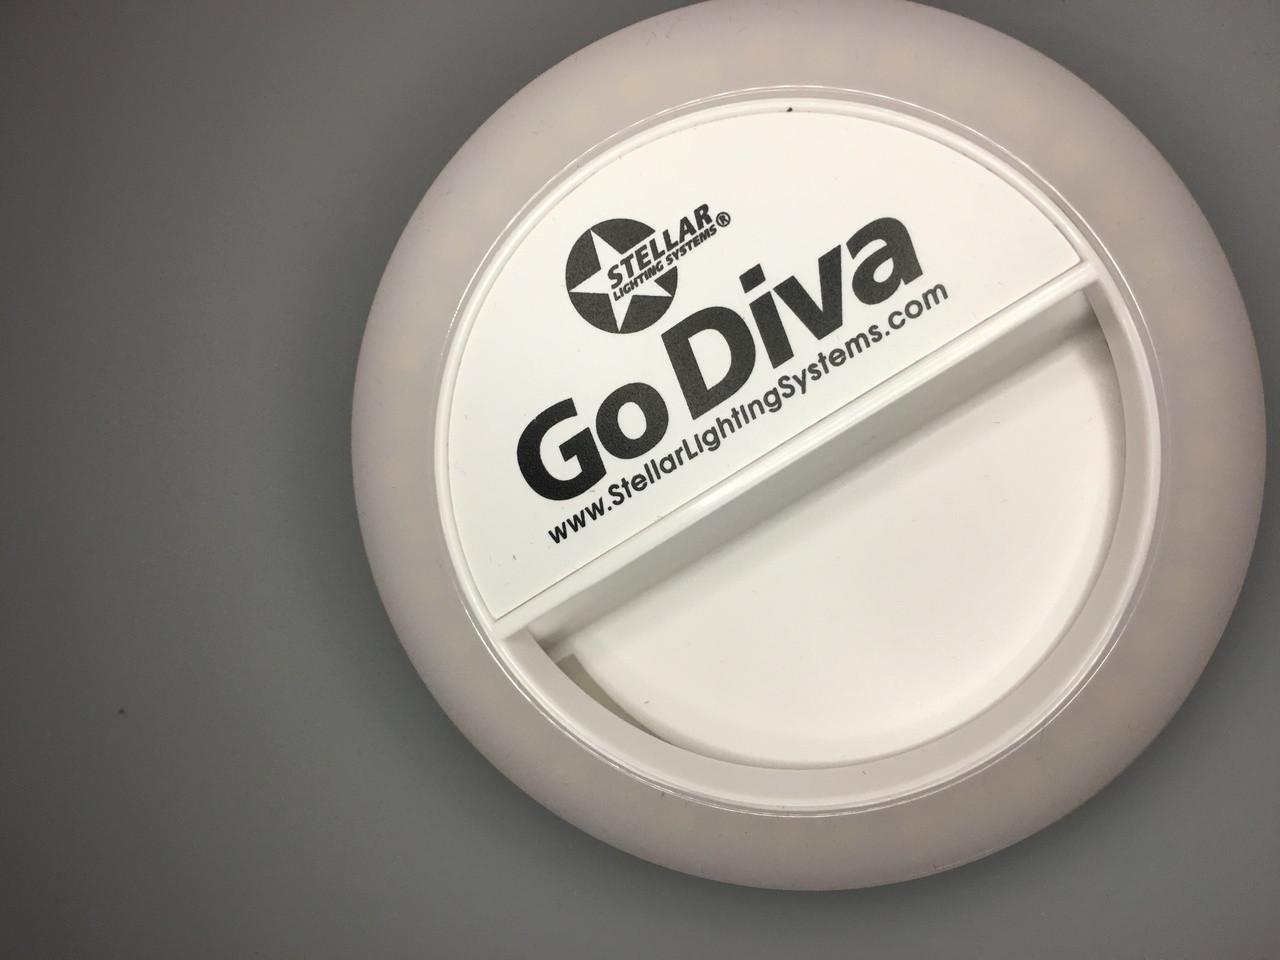 Go Diva Selfie Ring Light  Bi Color by Stellar Lighting Systems